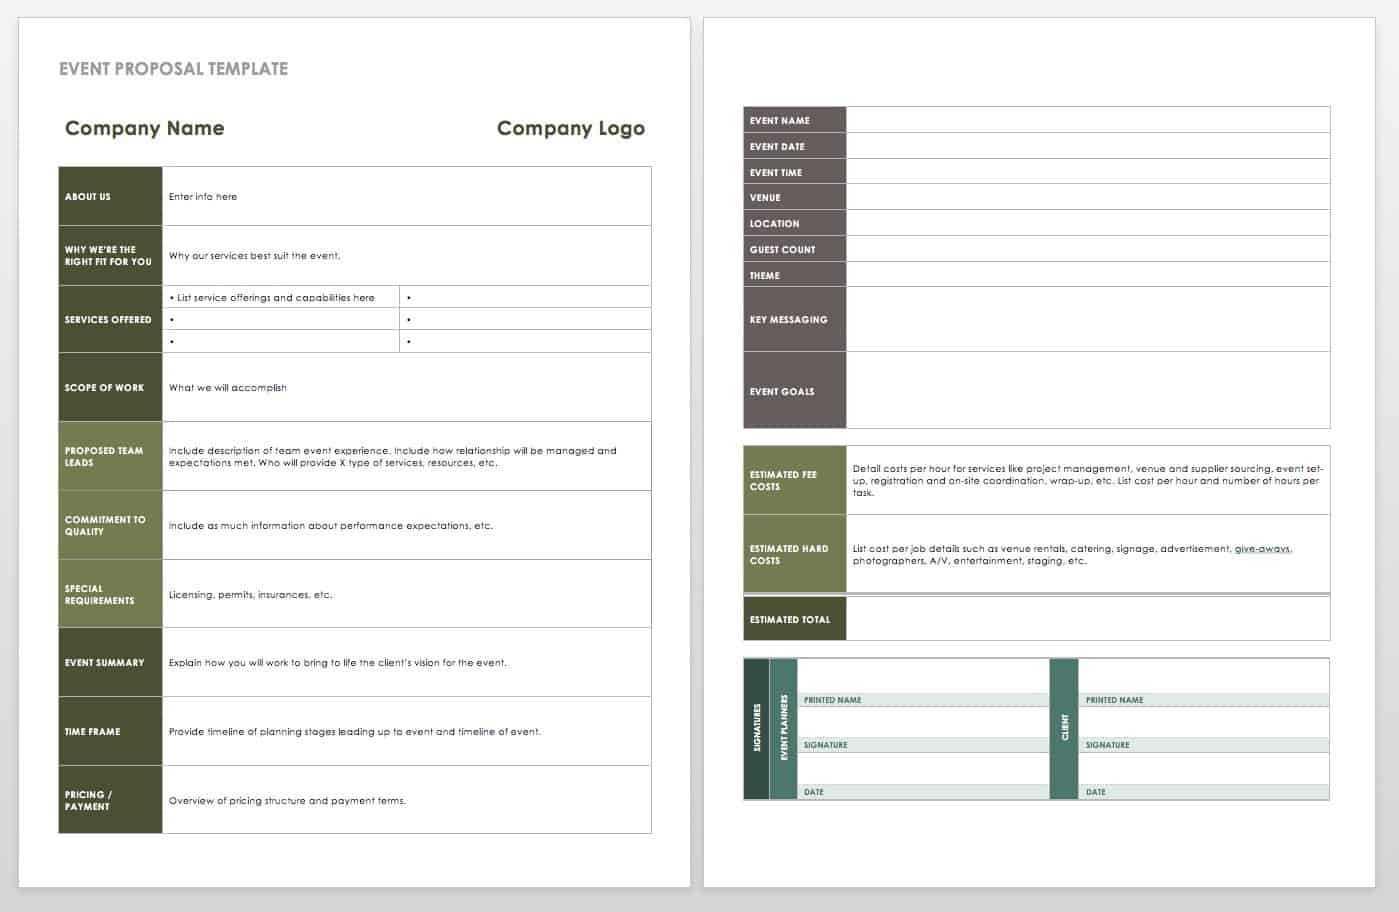 21 Free Event Planning Templates | Smartsheet regarding Free Event Program Templates Word